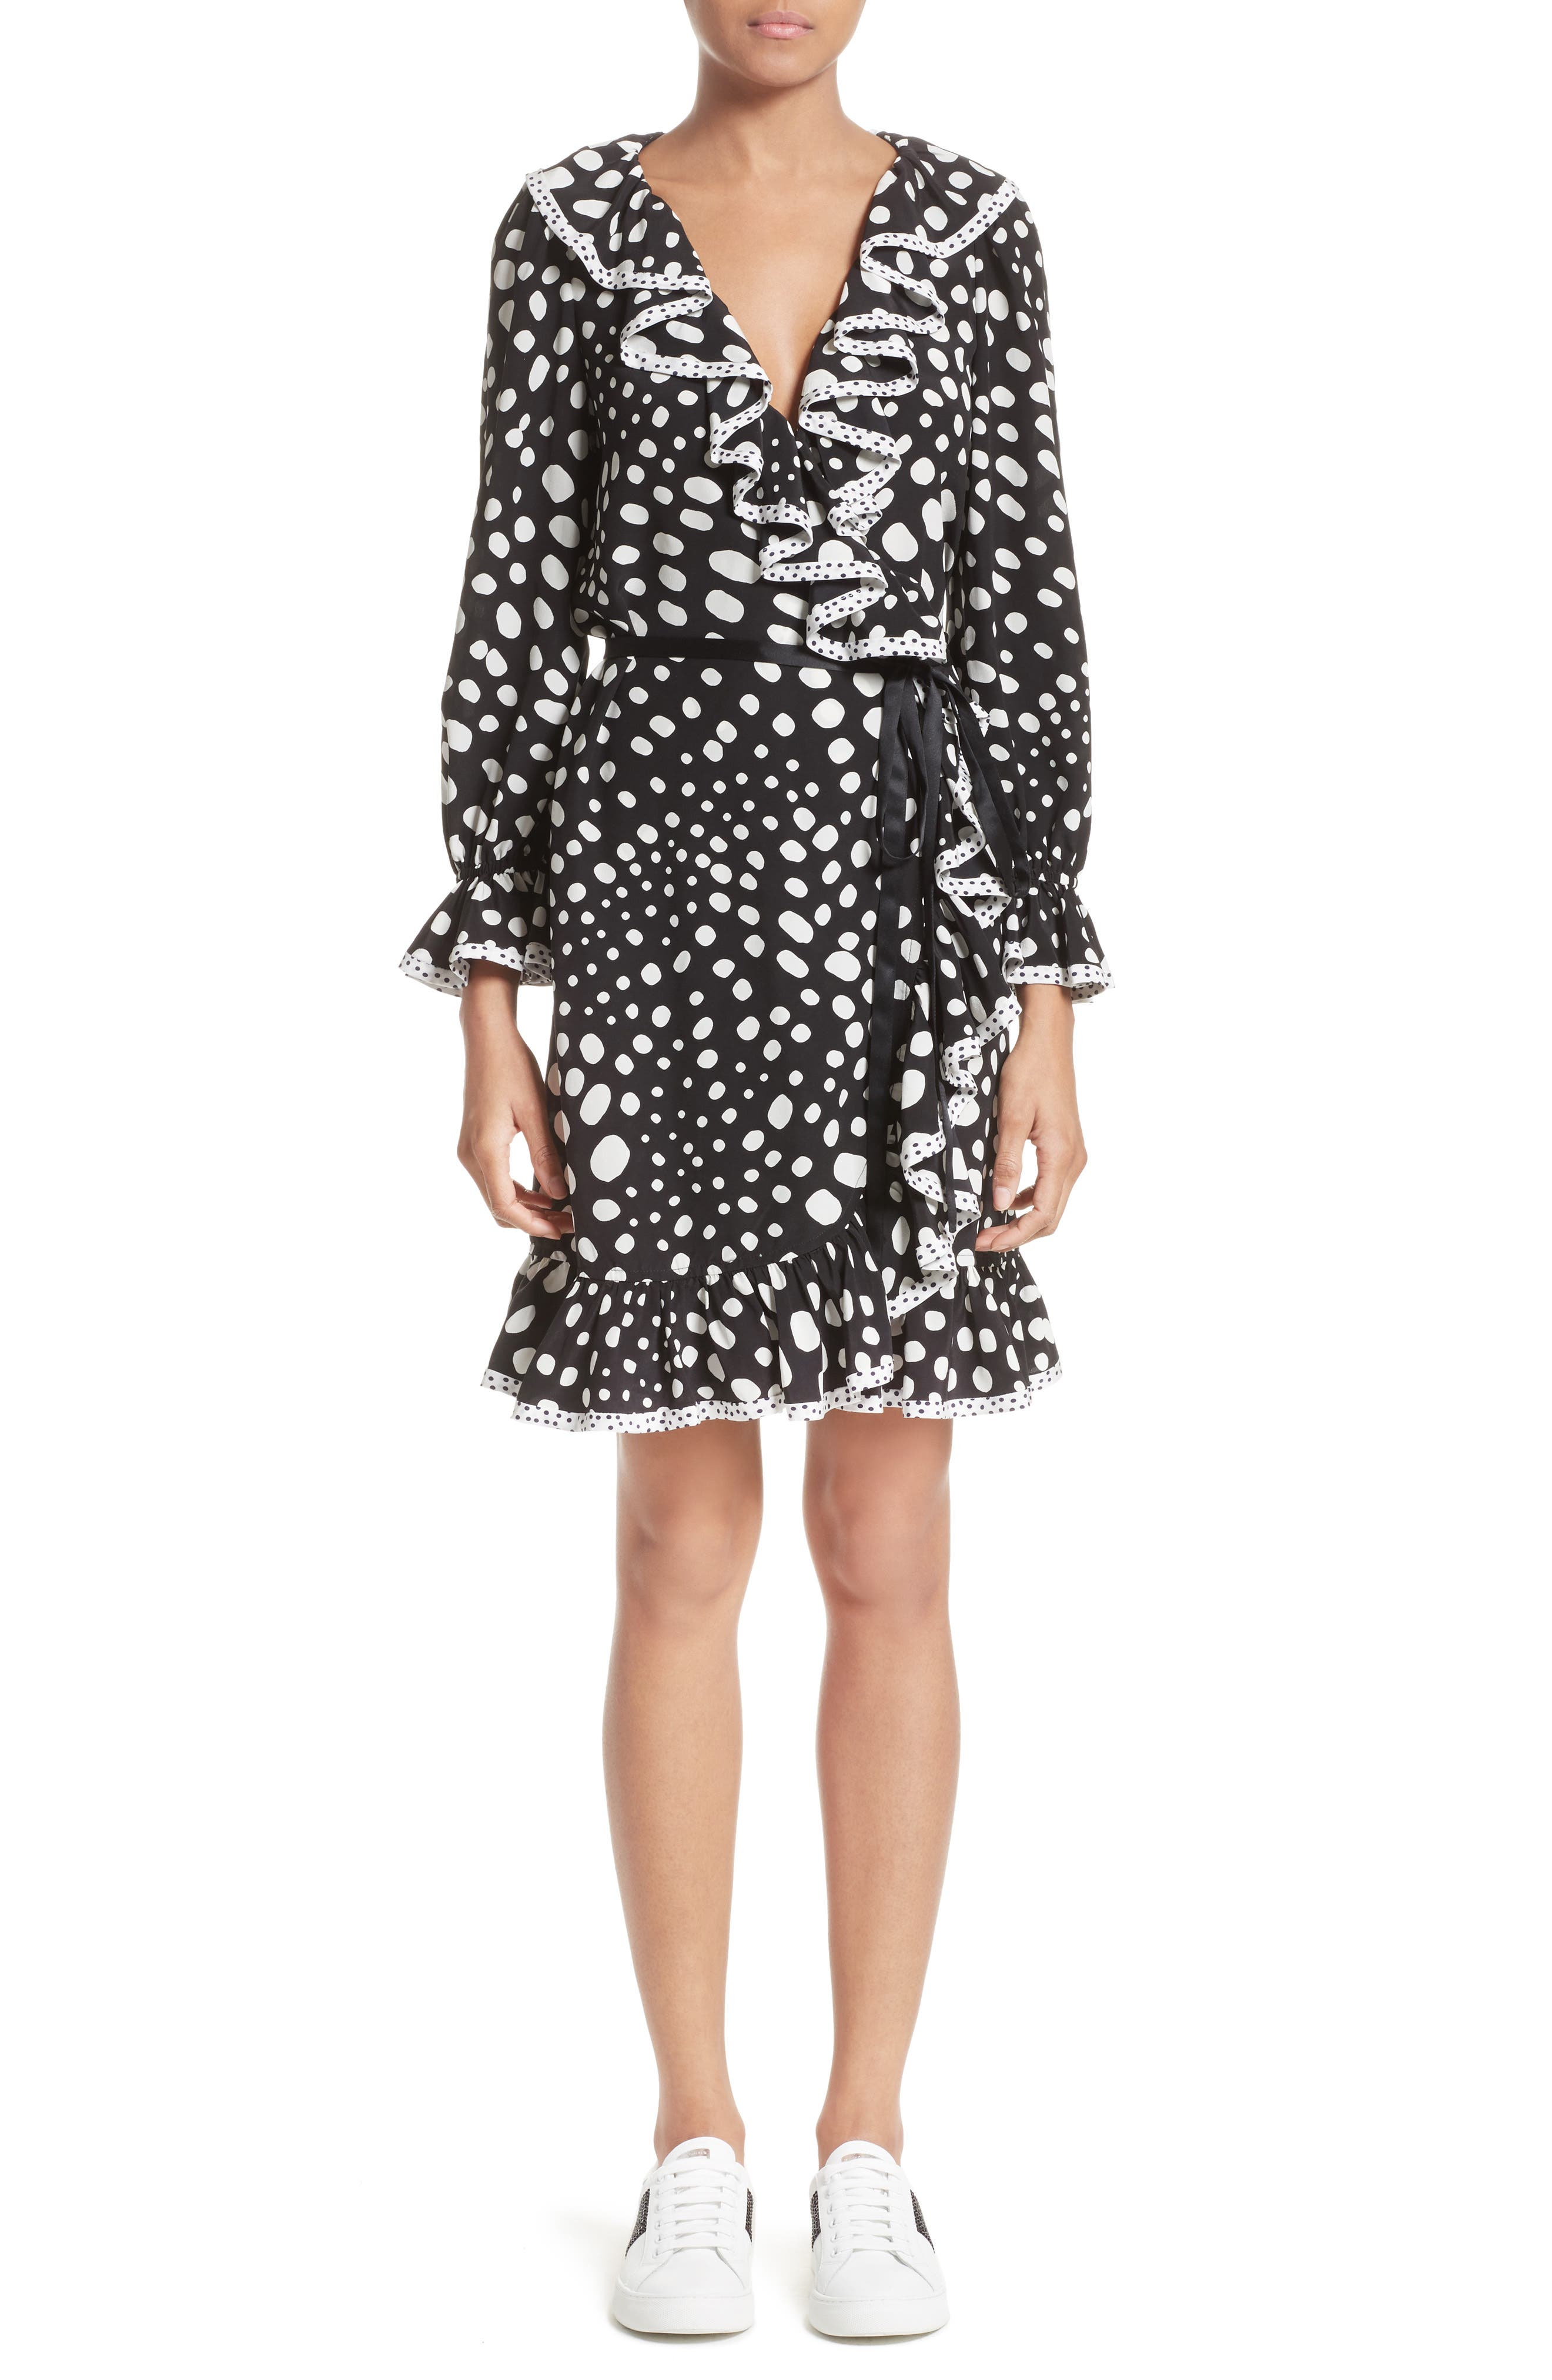 Alternate Image 1 Selected - MARC JACOBS Polka Dot Ruffle Silk Wrap Dress